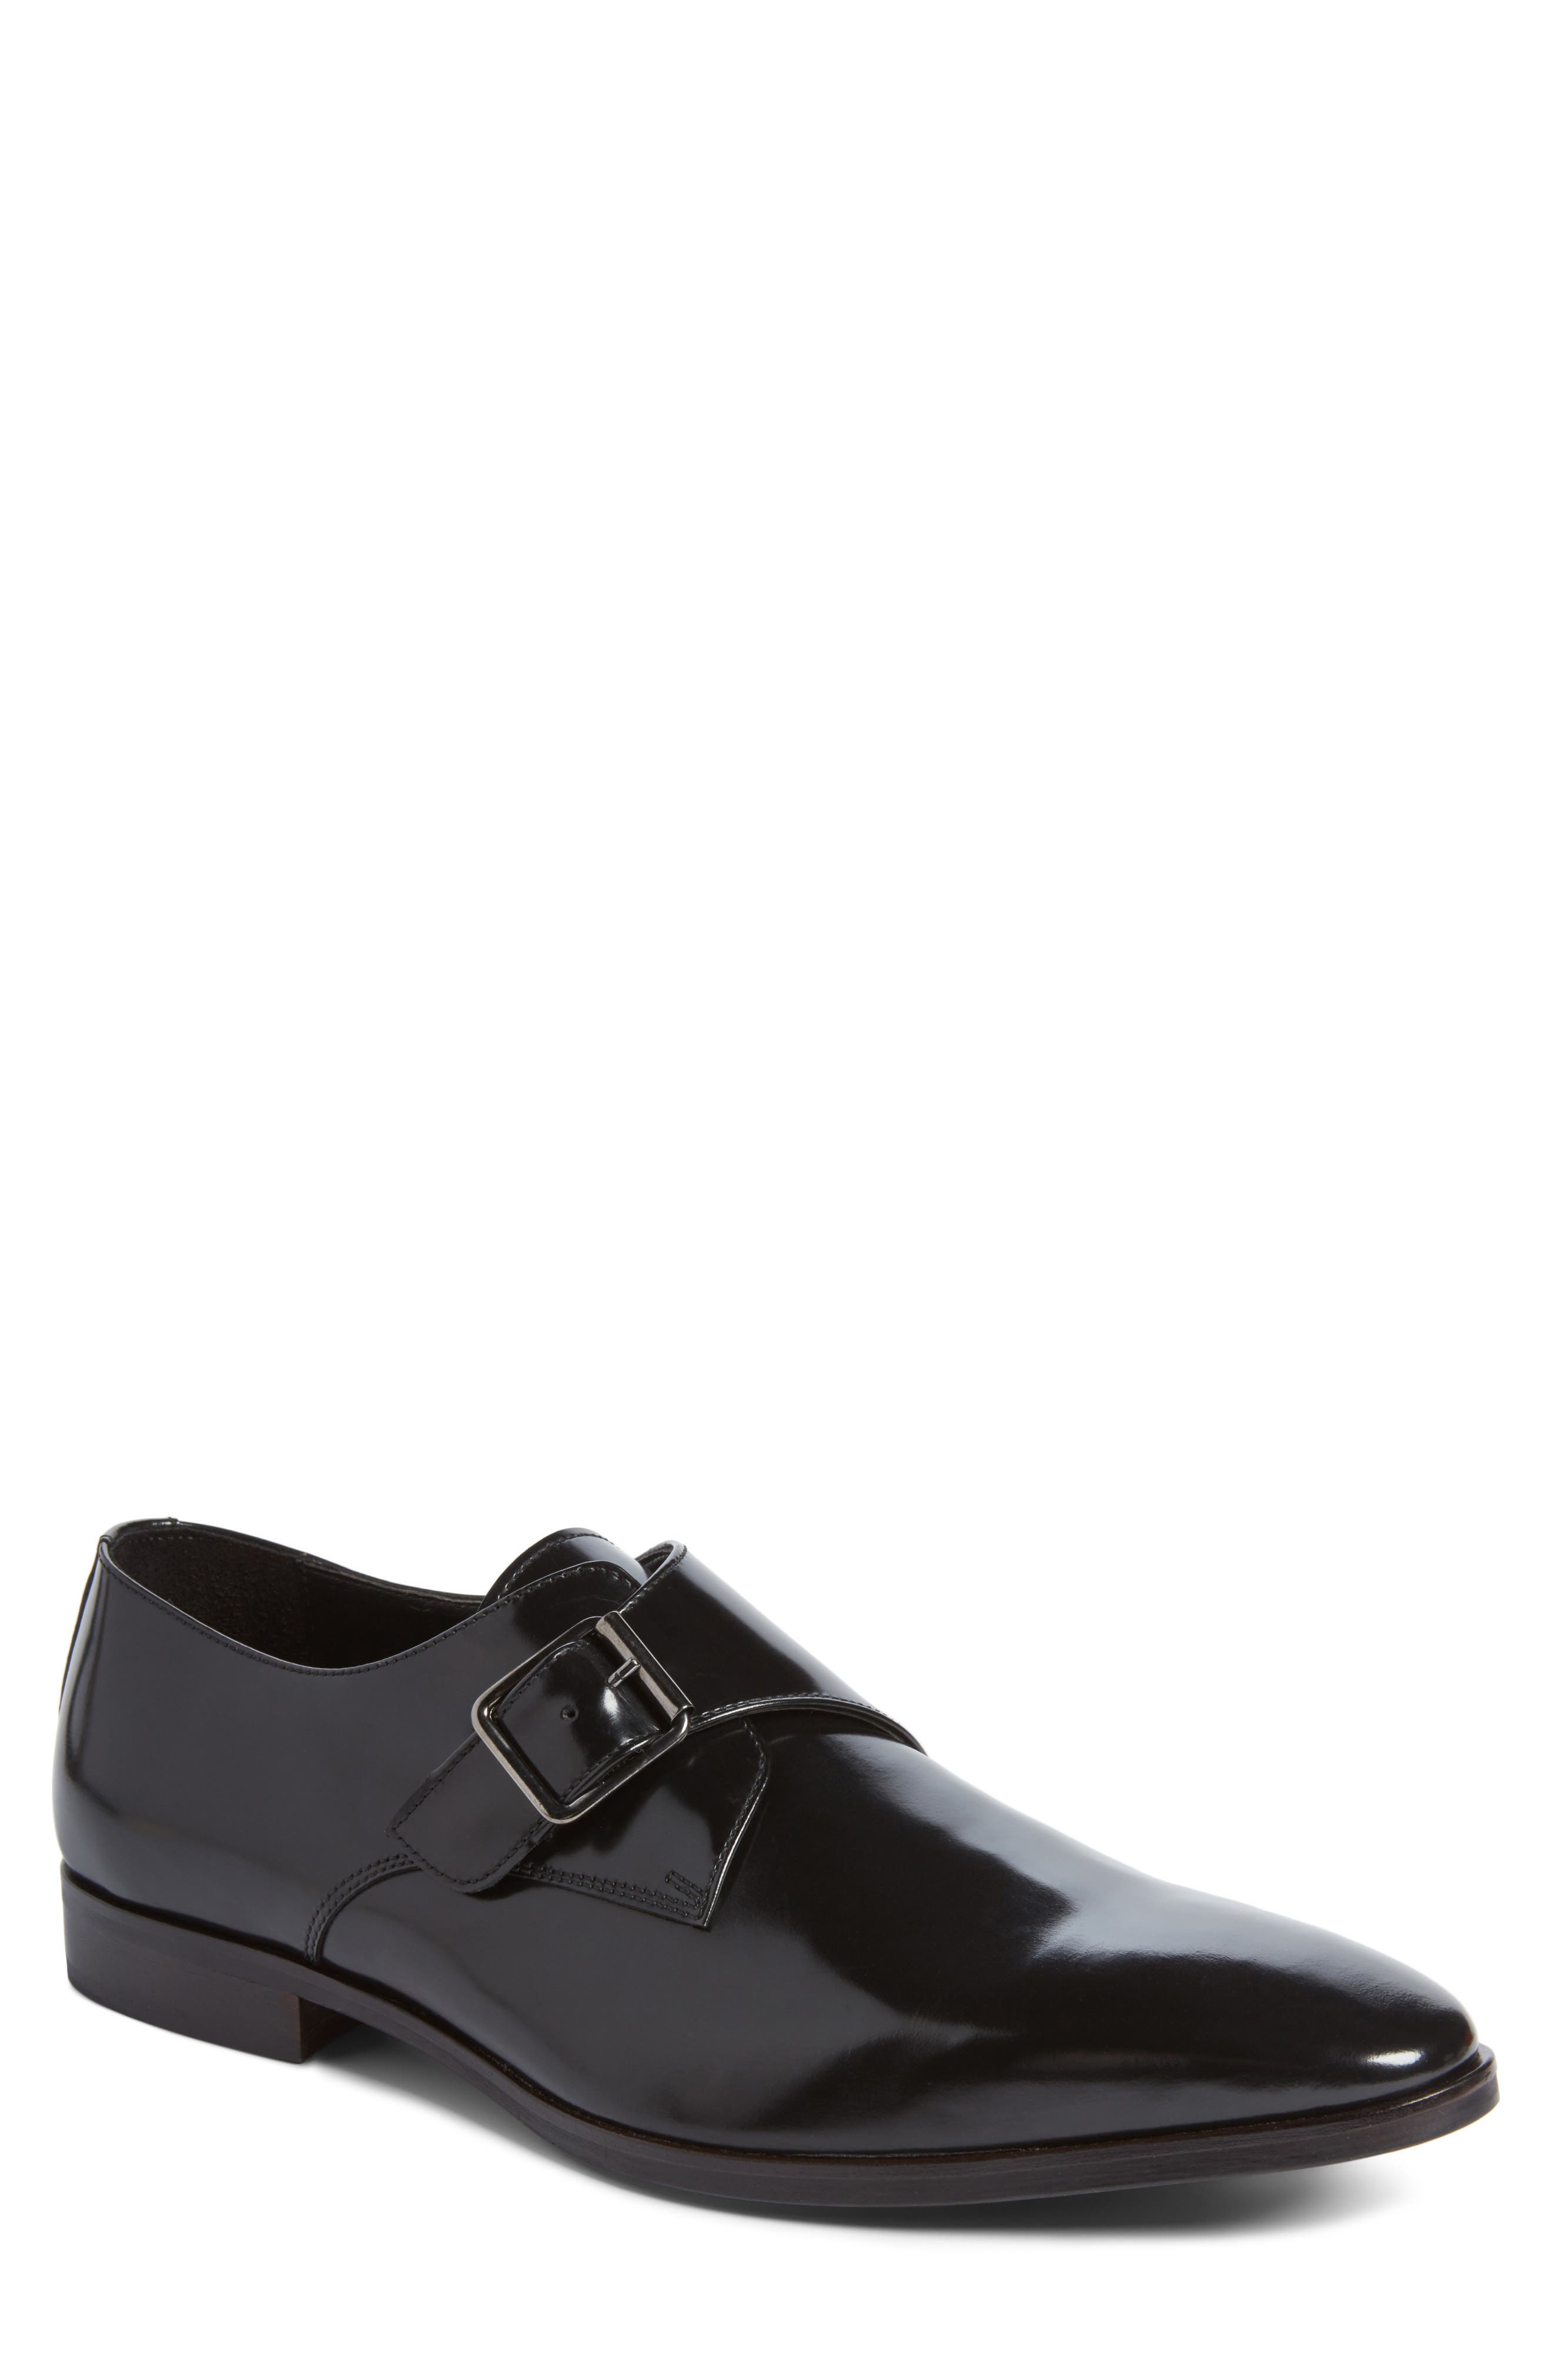 Webster Single Strap Monk Shoe,                             Main thumbnail 1, color,                             001